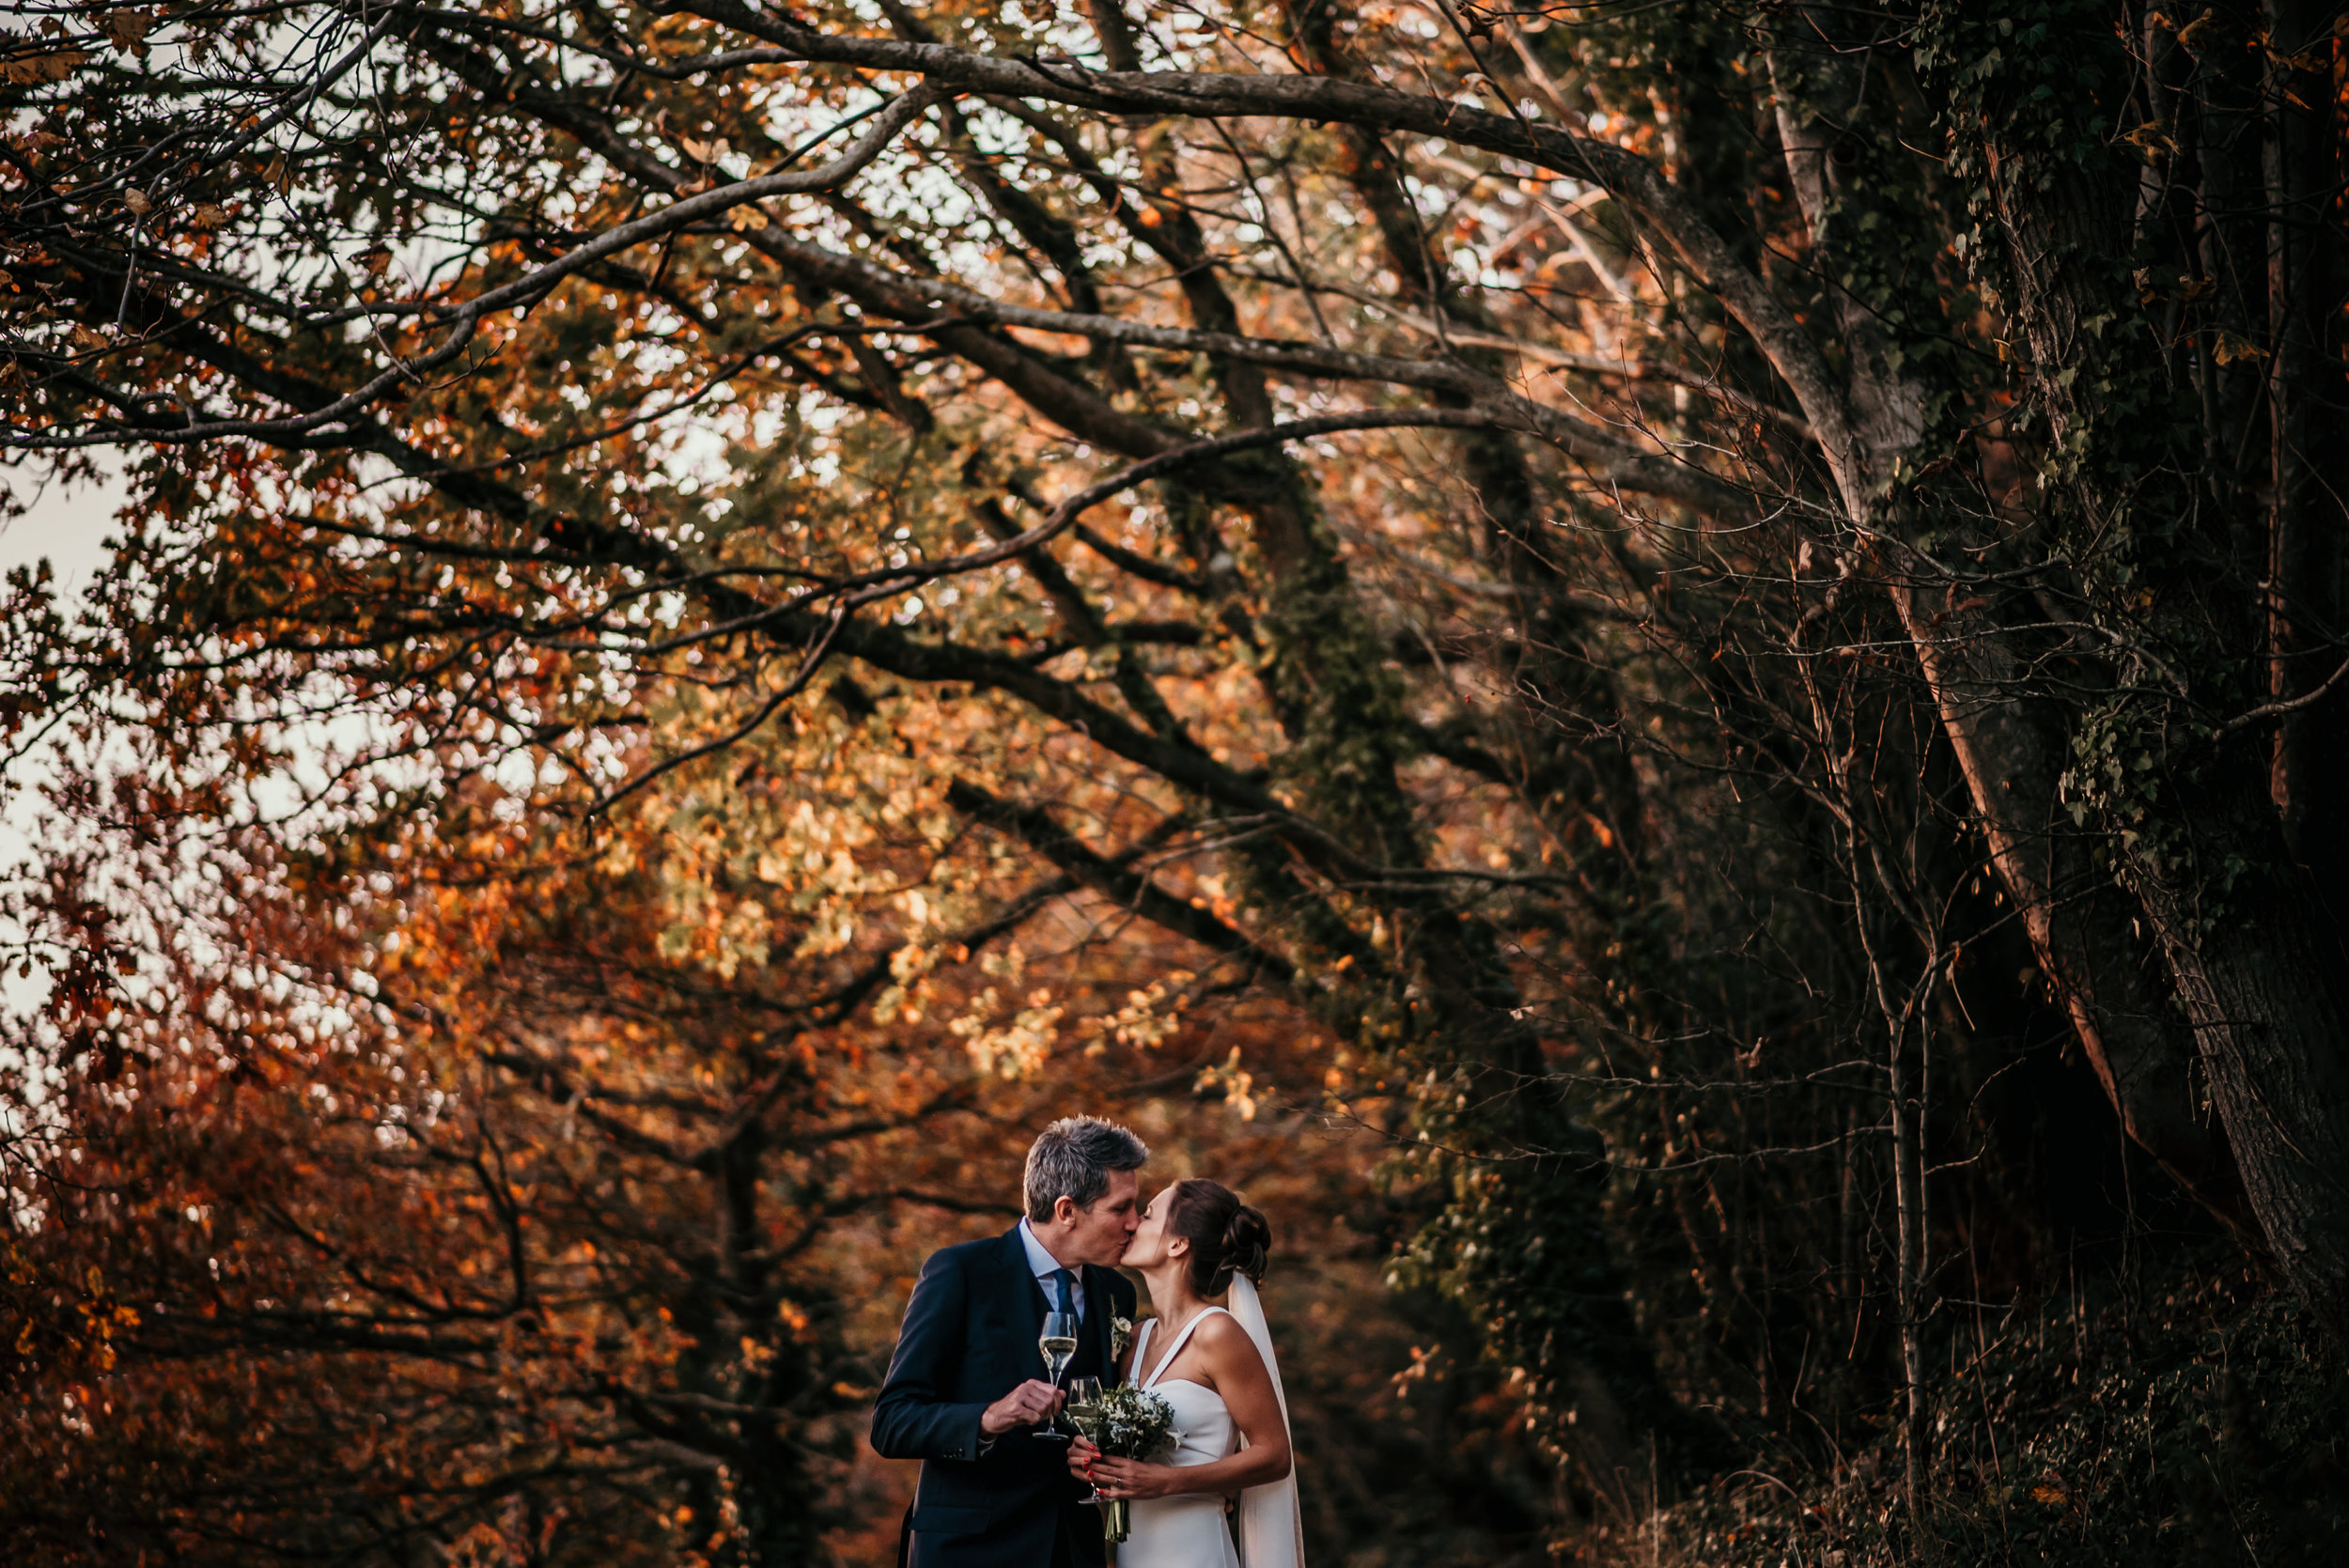 paschoe-house-devon-wedding-photographer.jpg